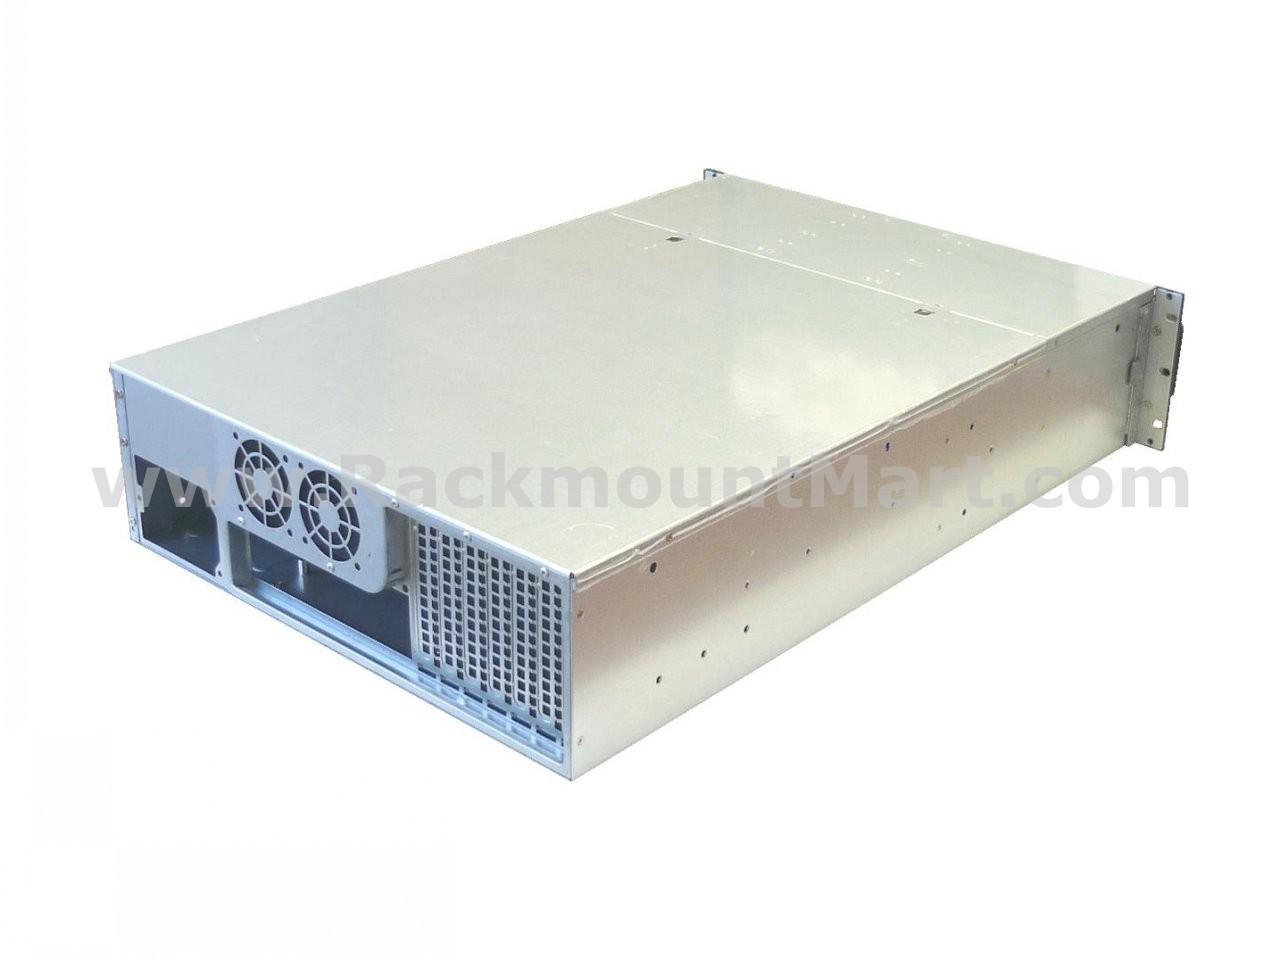 Formula sound fsm8+ mixer stereo, 4 microphone, 4 stereo inputs, 1u rackmount